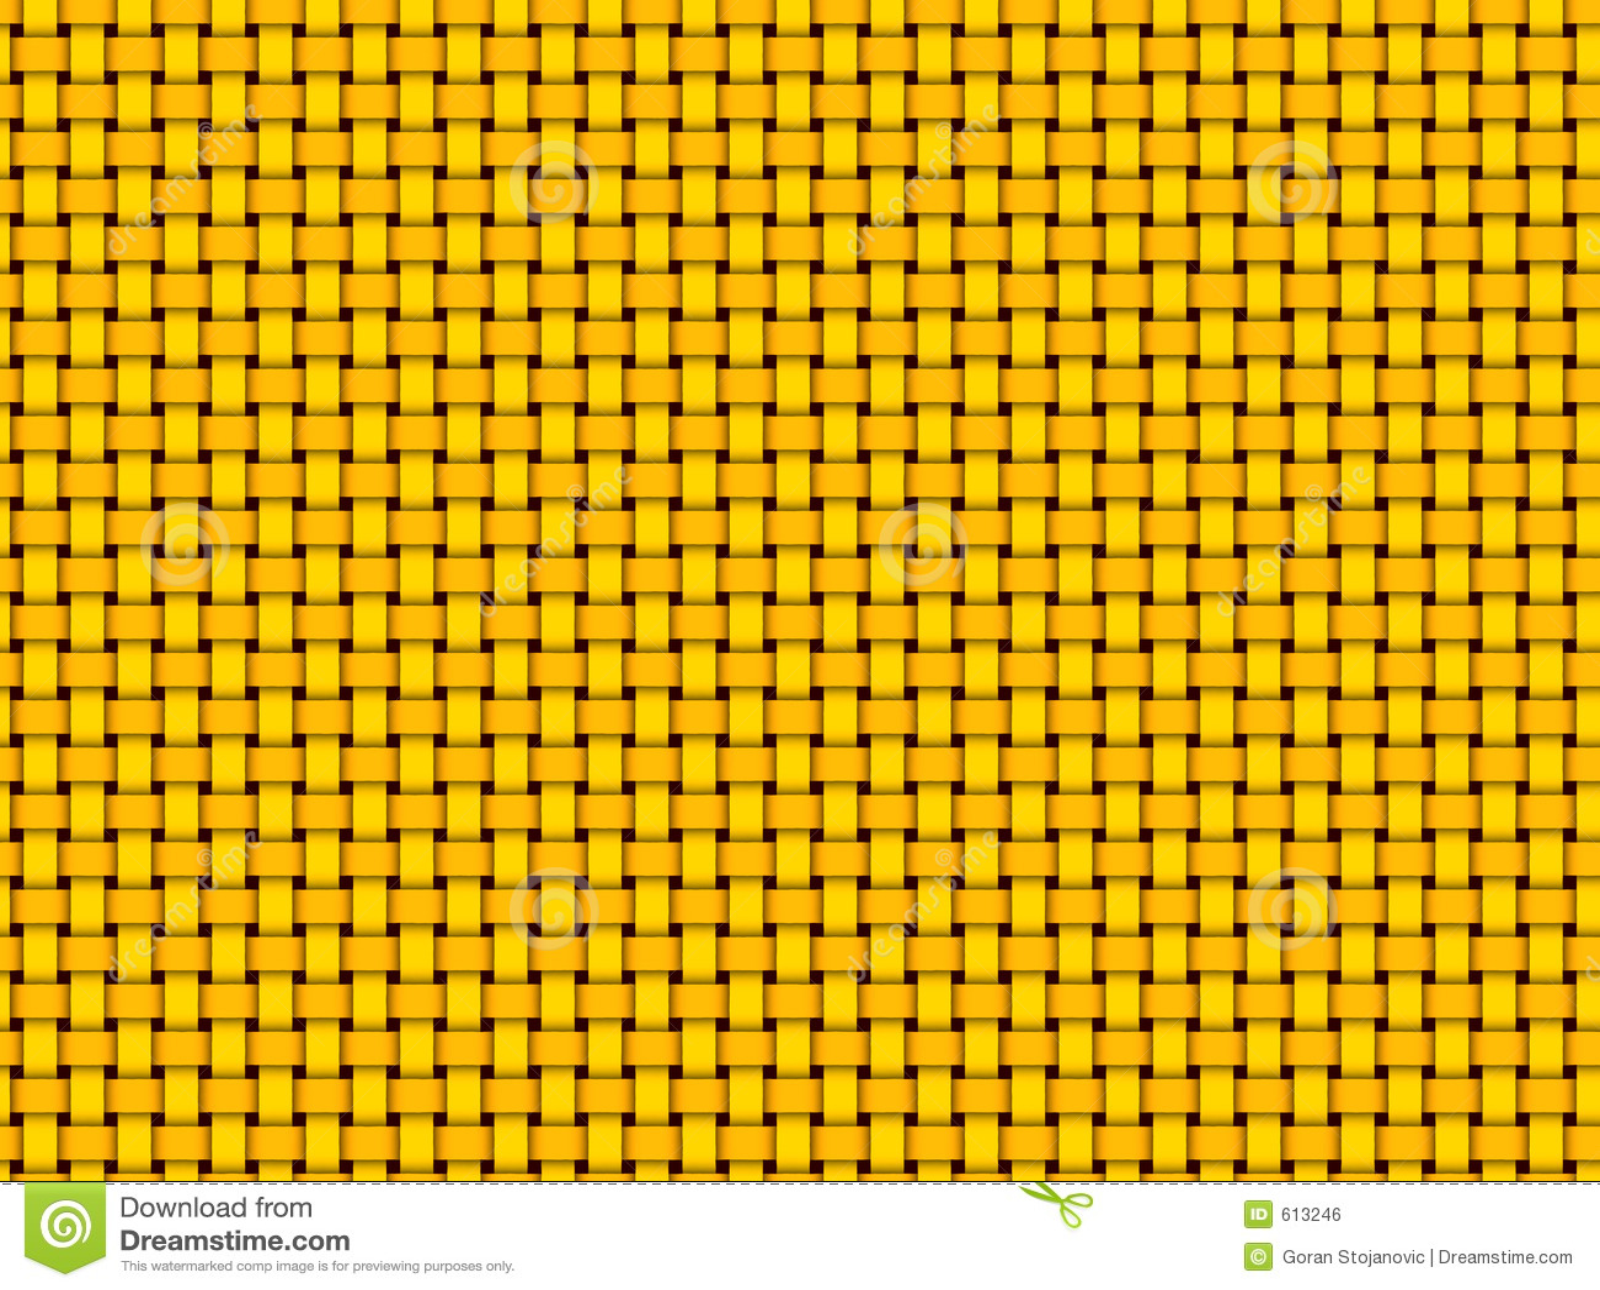 Free Basket Weaving Patterns Pictures : Basket weave pattern stock illustration image of